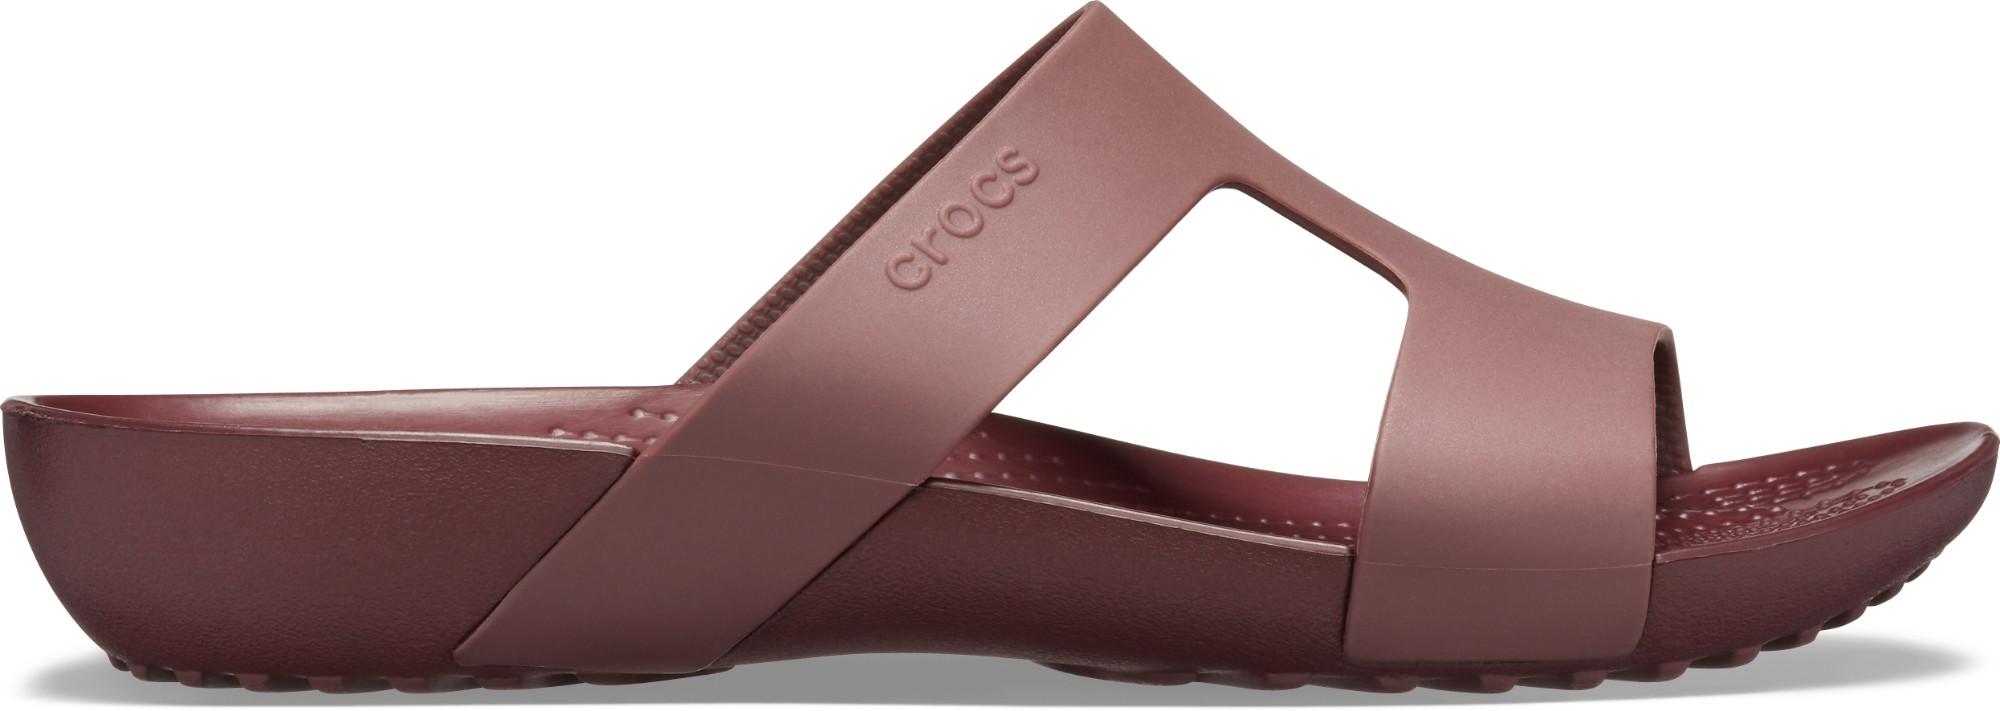 Crocs™ Serena Slide Women's Burgundy 36,5